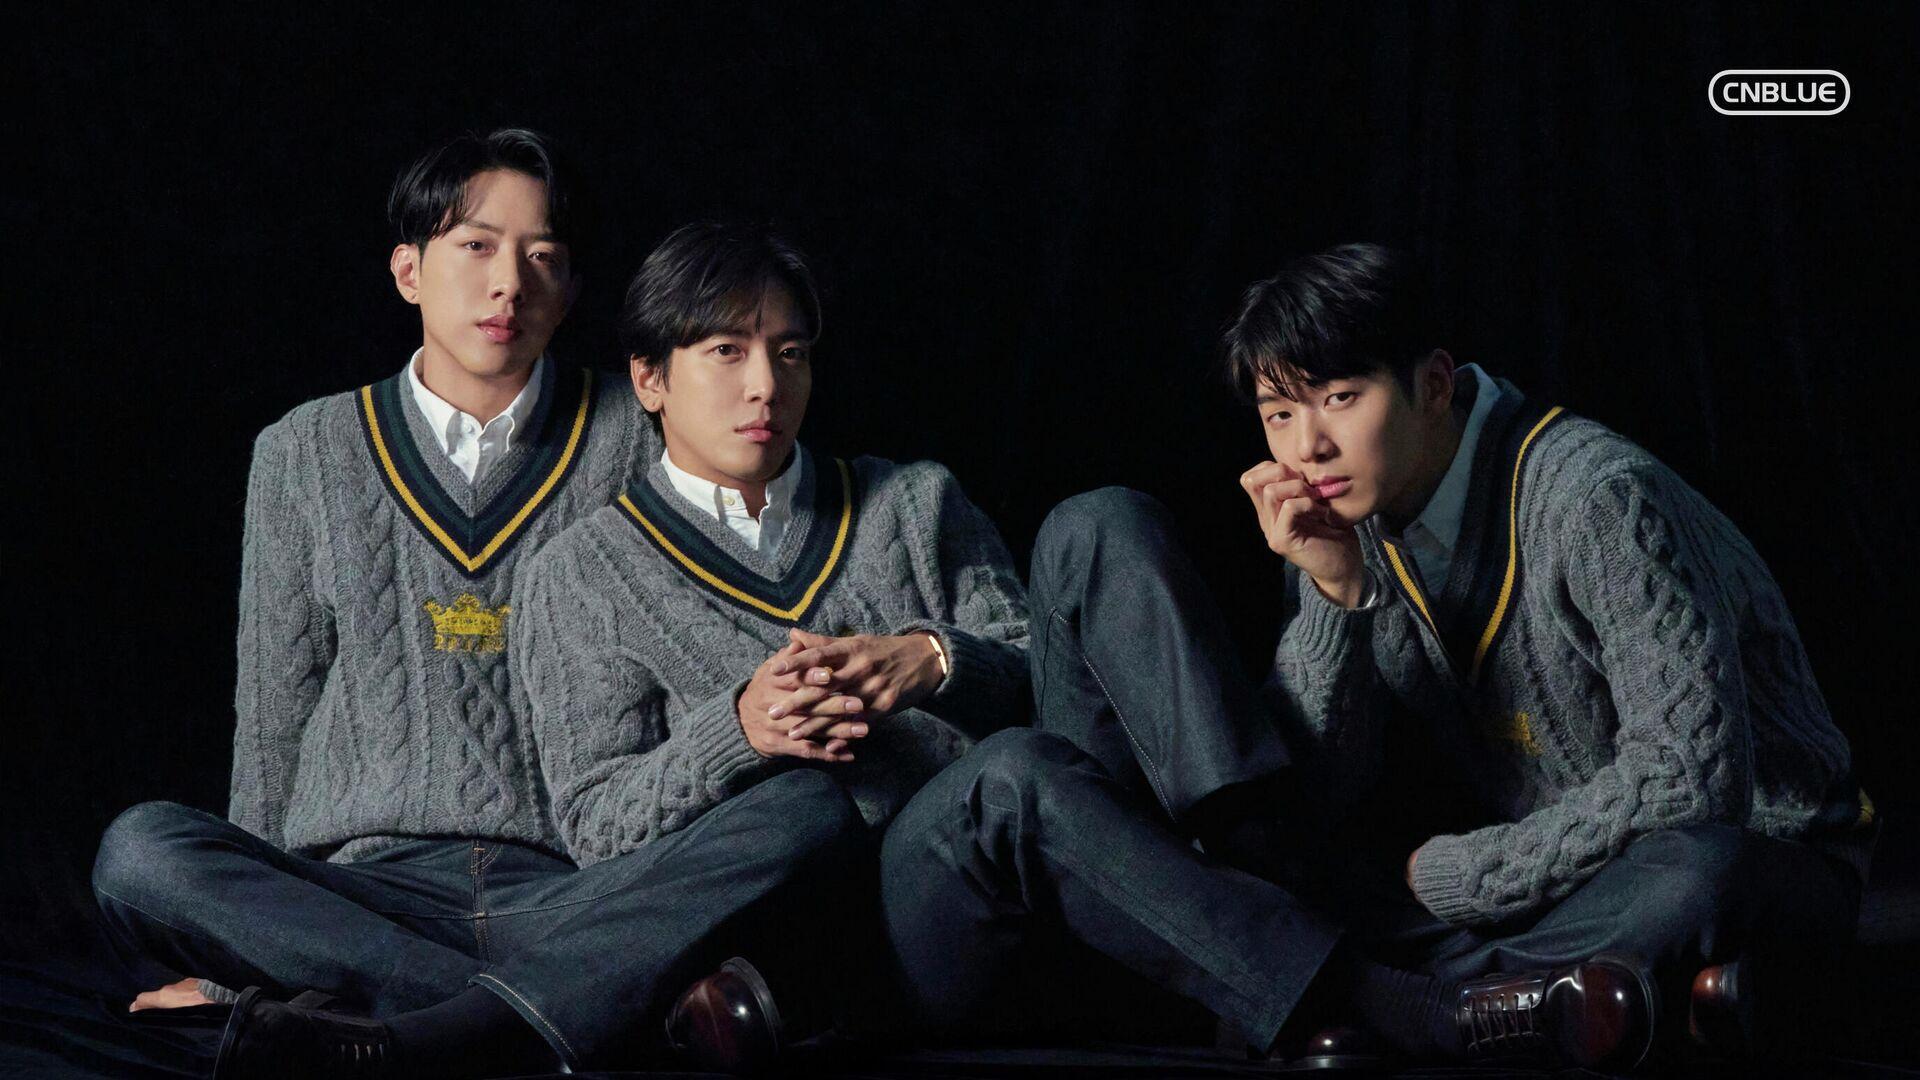 Veteran South Korean Pop Rock Stars CNBLUE Get Set For Their Comeback - Sputnik International, 1920, 08.10.2021